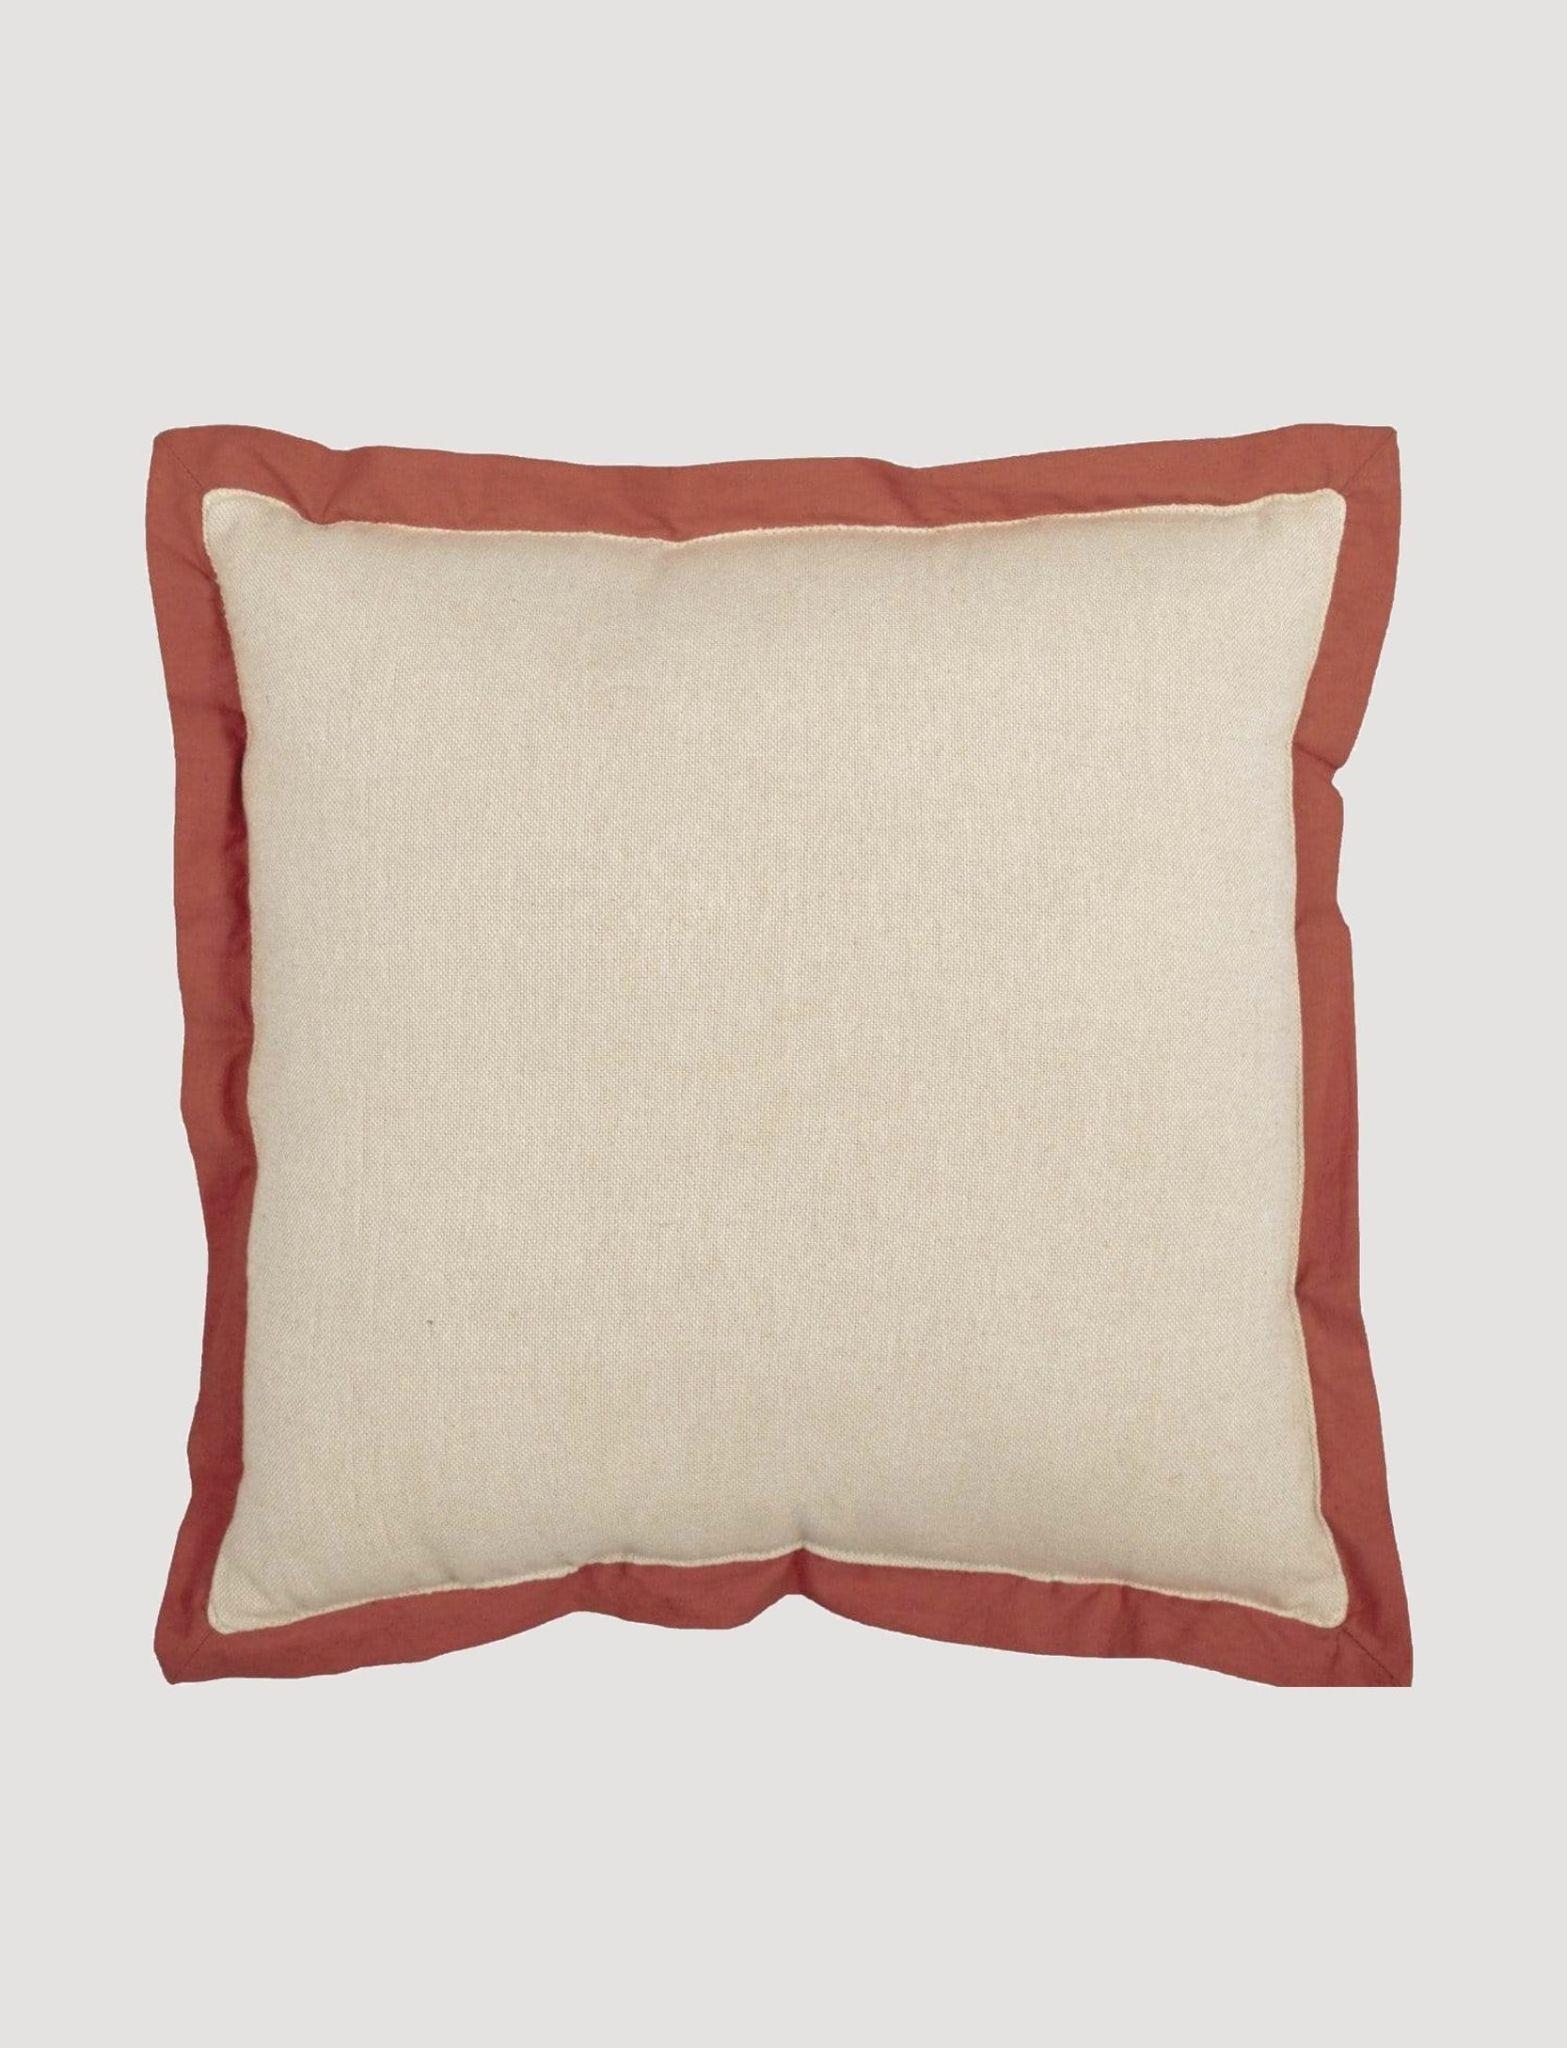 VHC Brands Farmer's Market Fresh Strawberries Pillow - 12x12